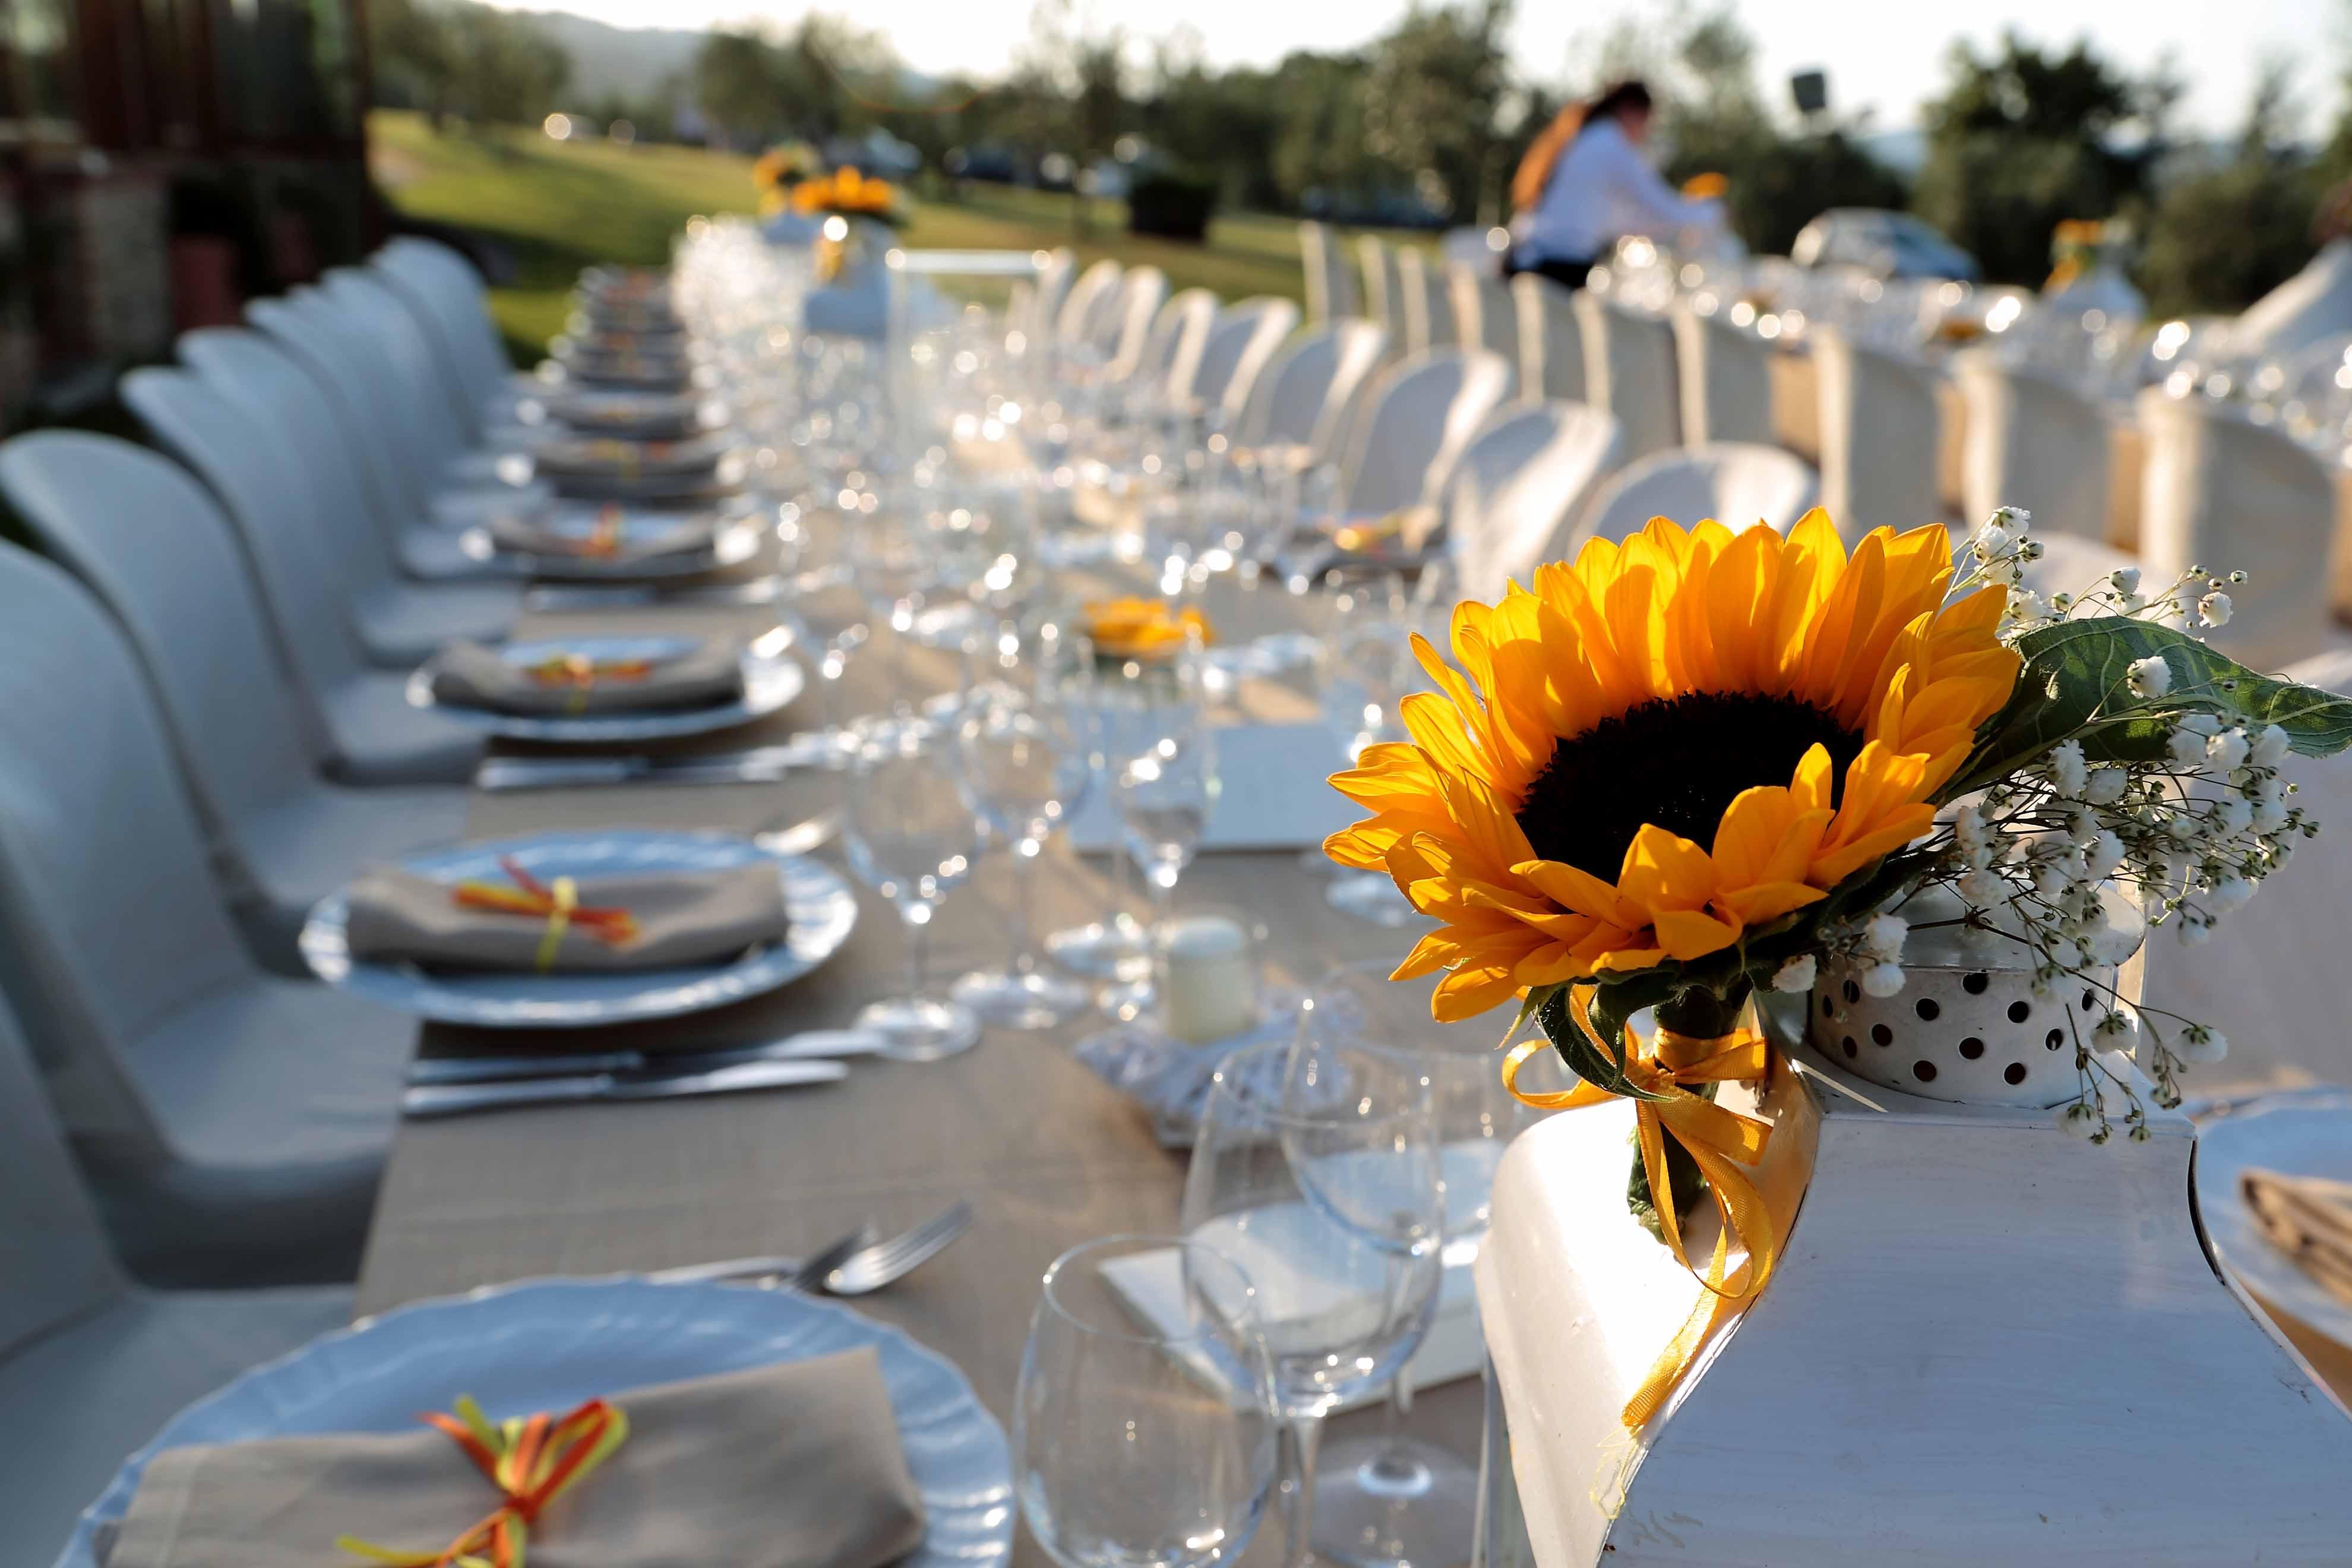 Guestbook Matrimonio Girasoli : Officine creative guestbook per matrimonio con girasoli